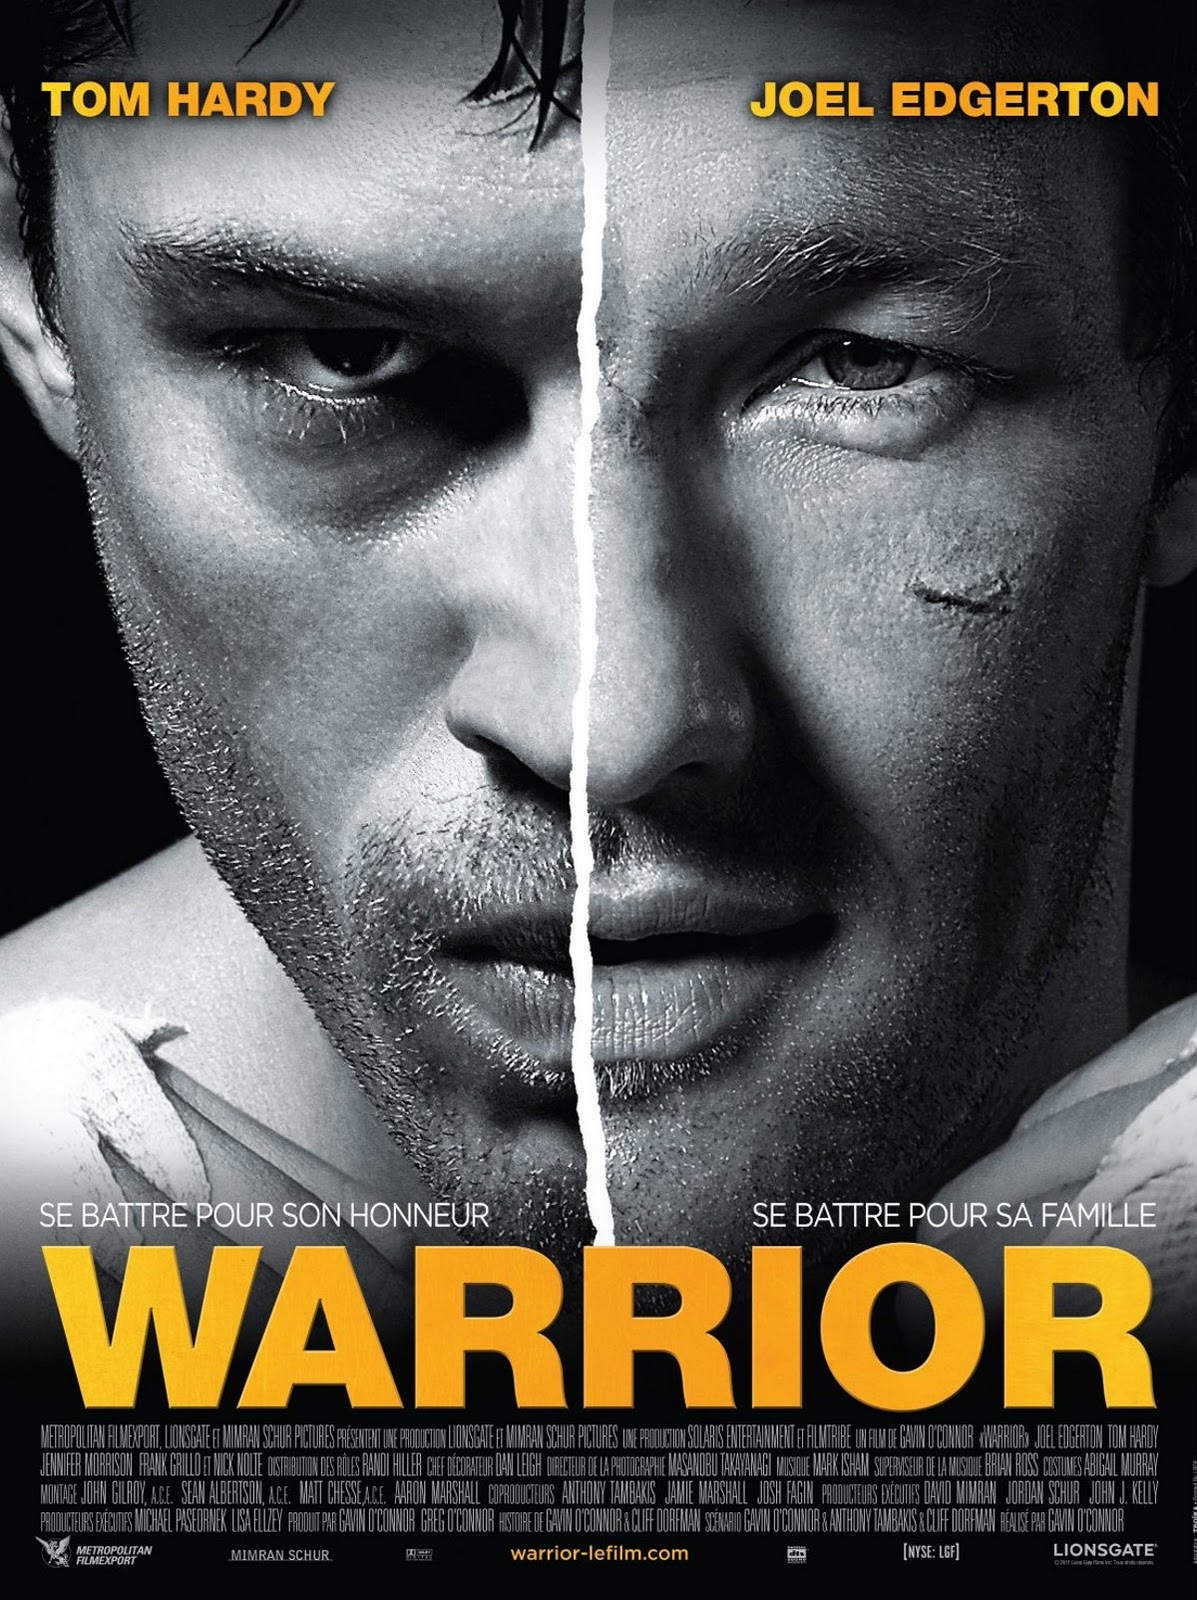 http://2.bp.blogspot.com/-eYV1vFNSaWw/Tu9wSGbpNUI/AAAAAAAABTs/WYTrRh40X_k/s1600/Warrior.jpg